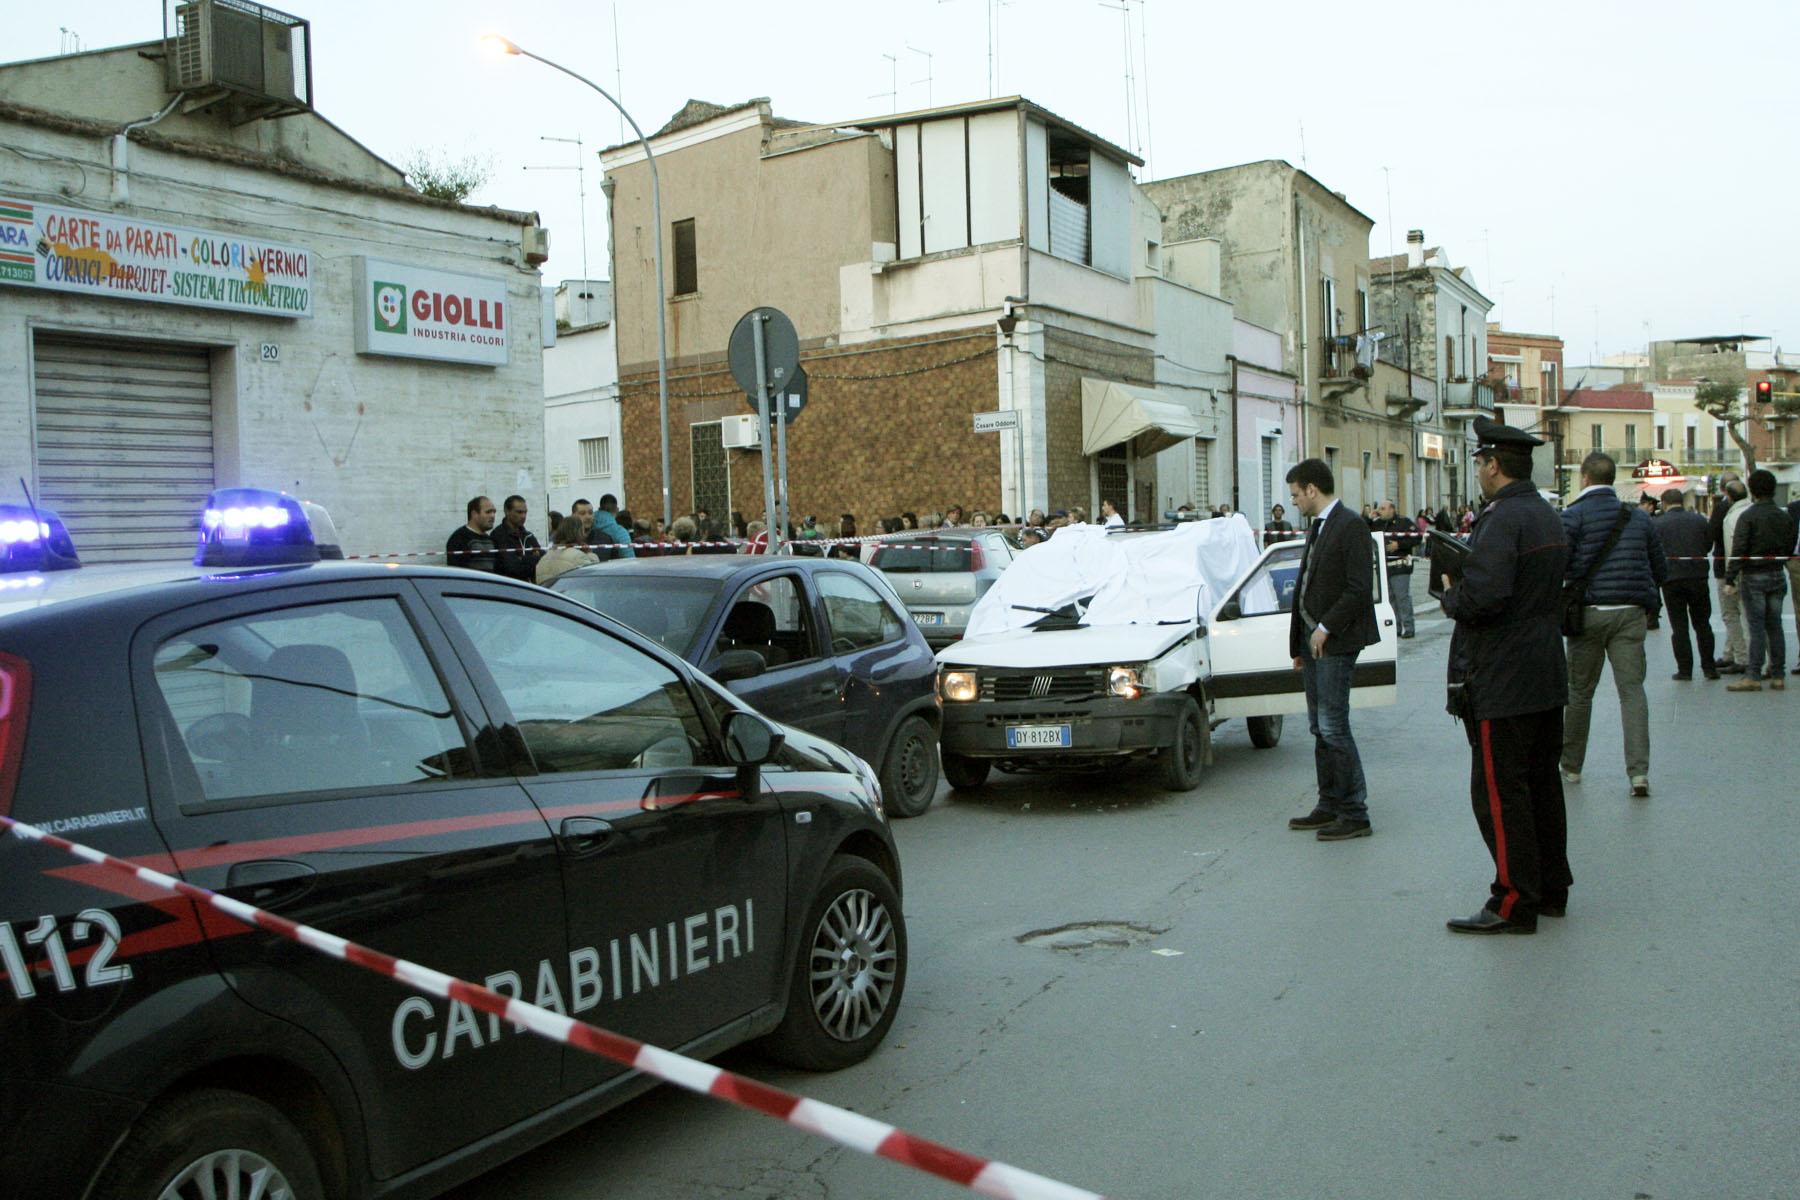 Omicidio in via lucera1